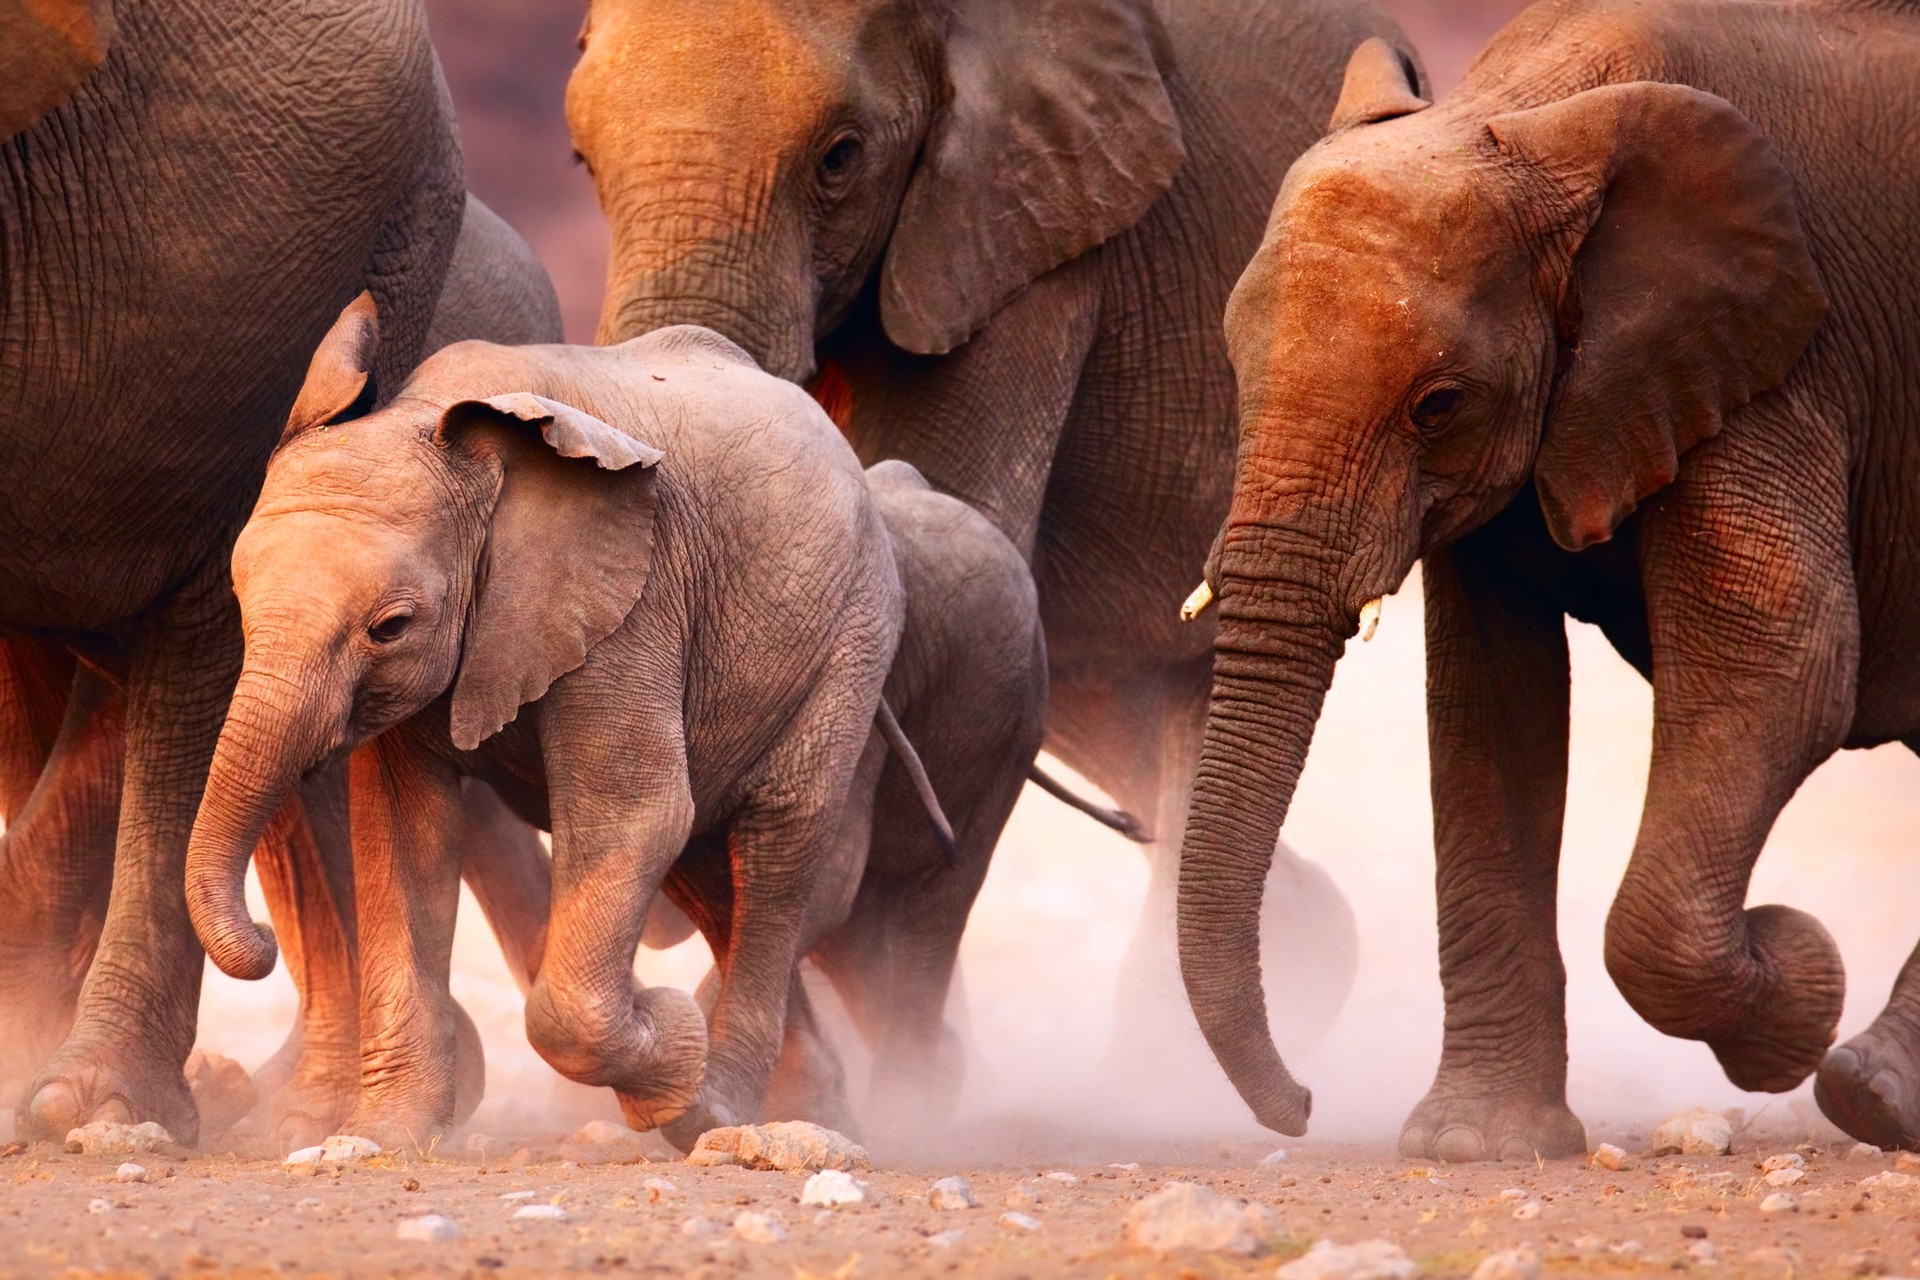 A herd of elephants walk through Etosha National Park, Namibia